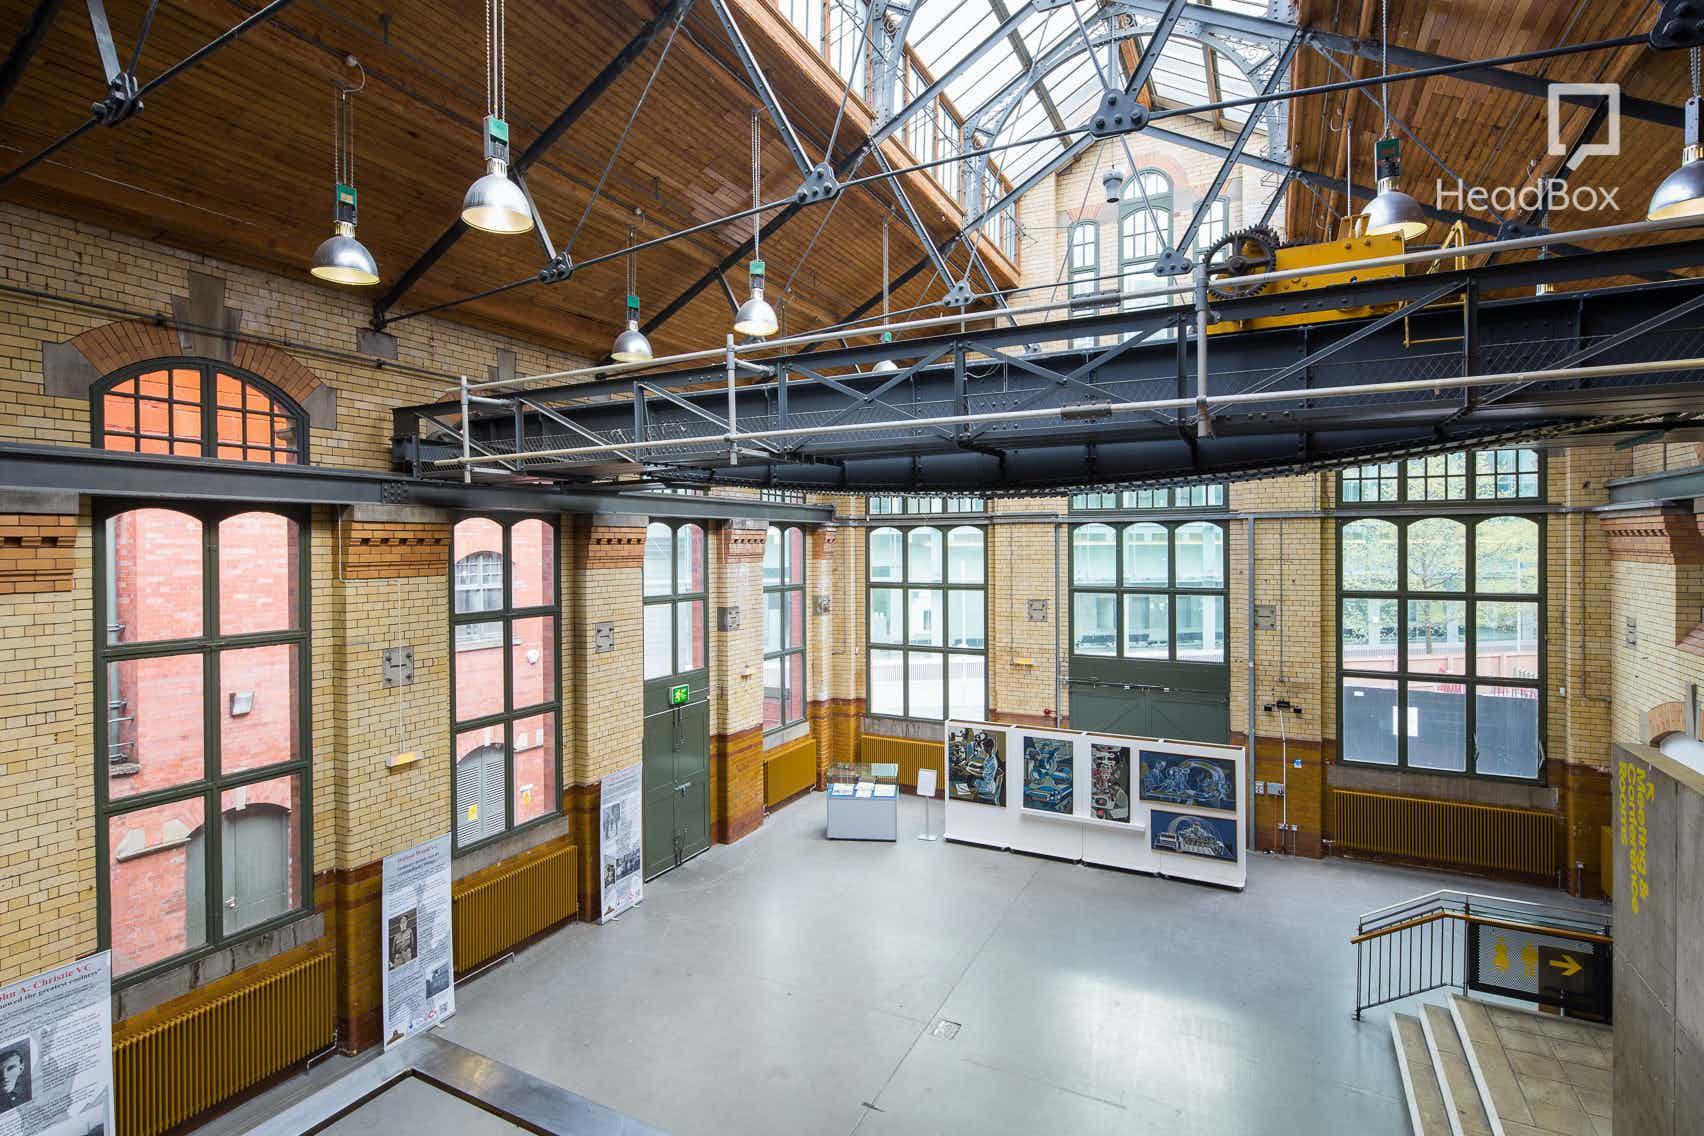 Engine Hall, People's History Museum